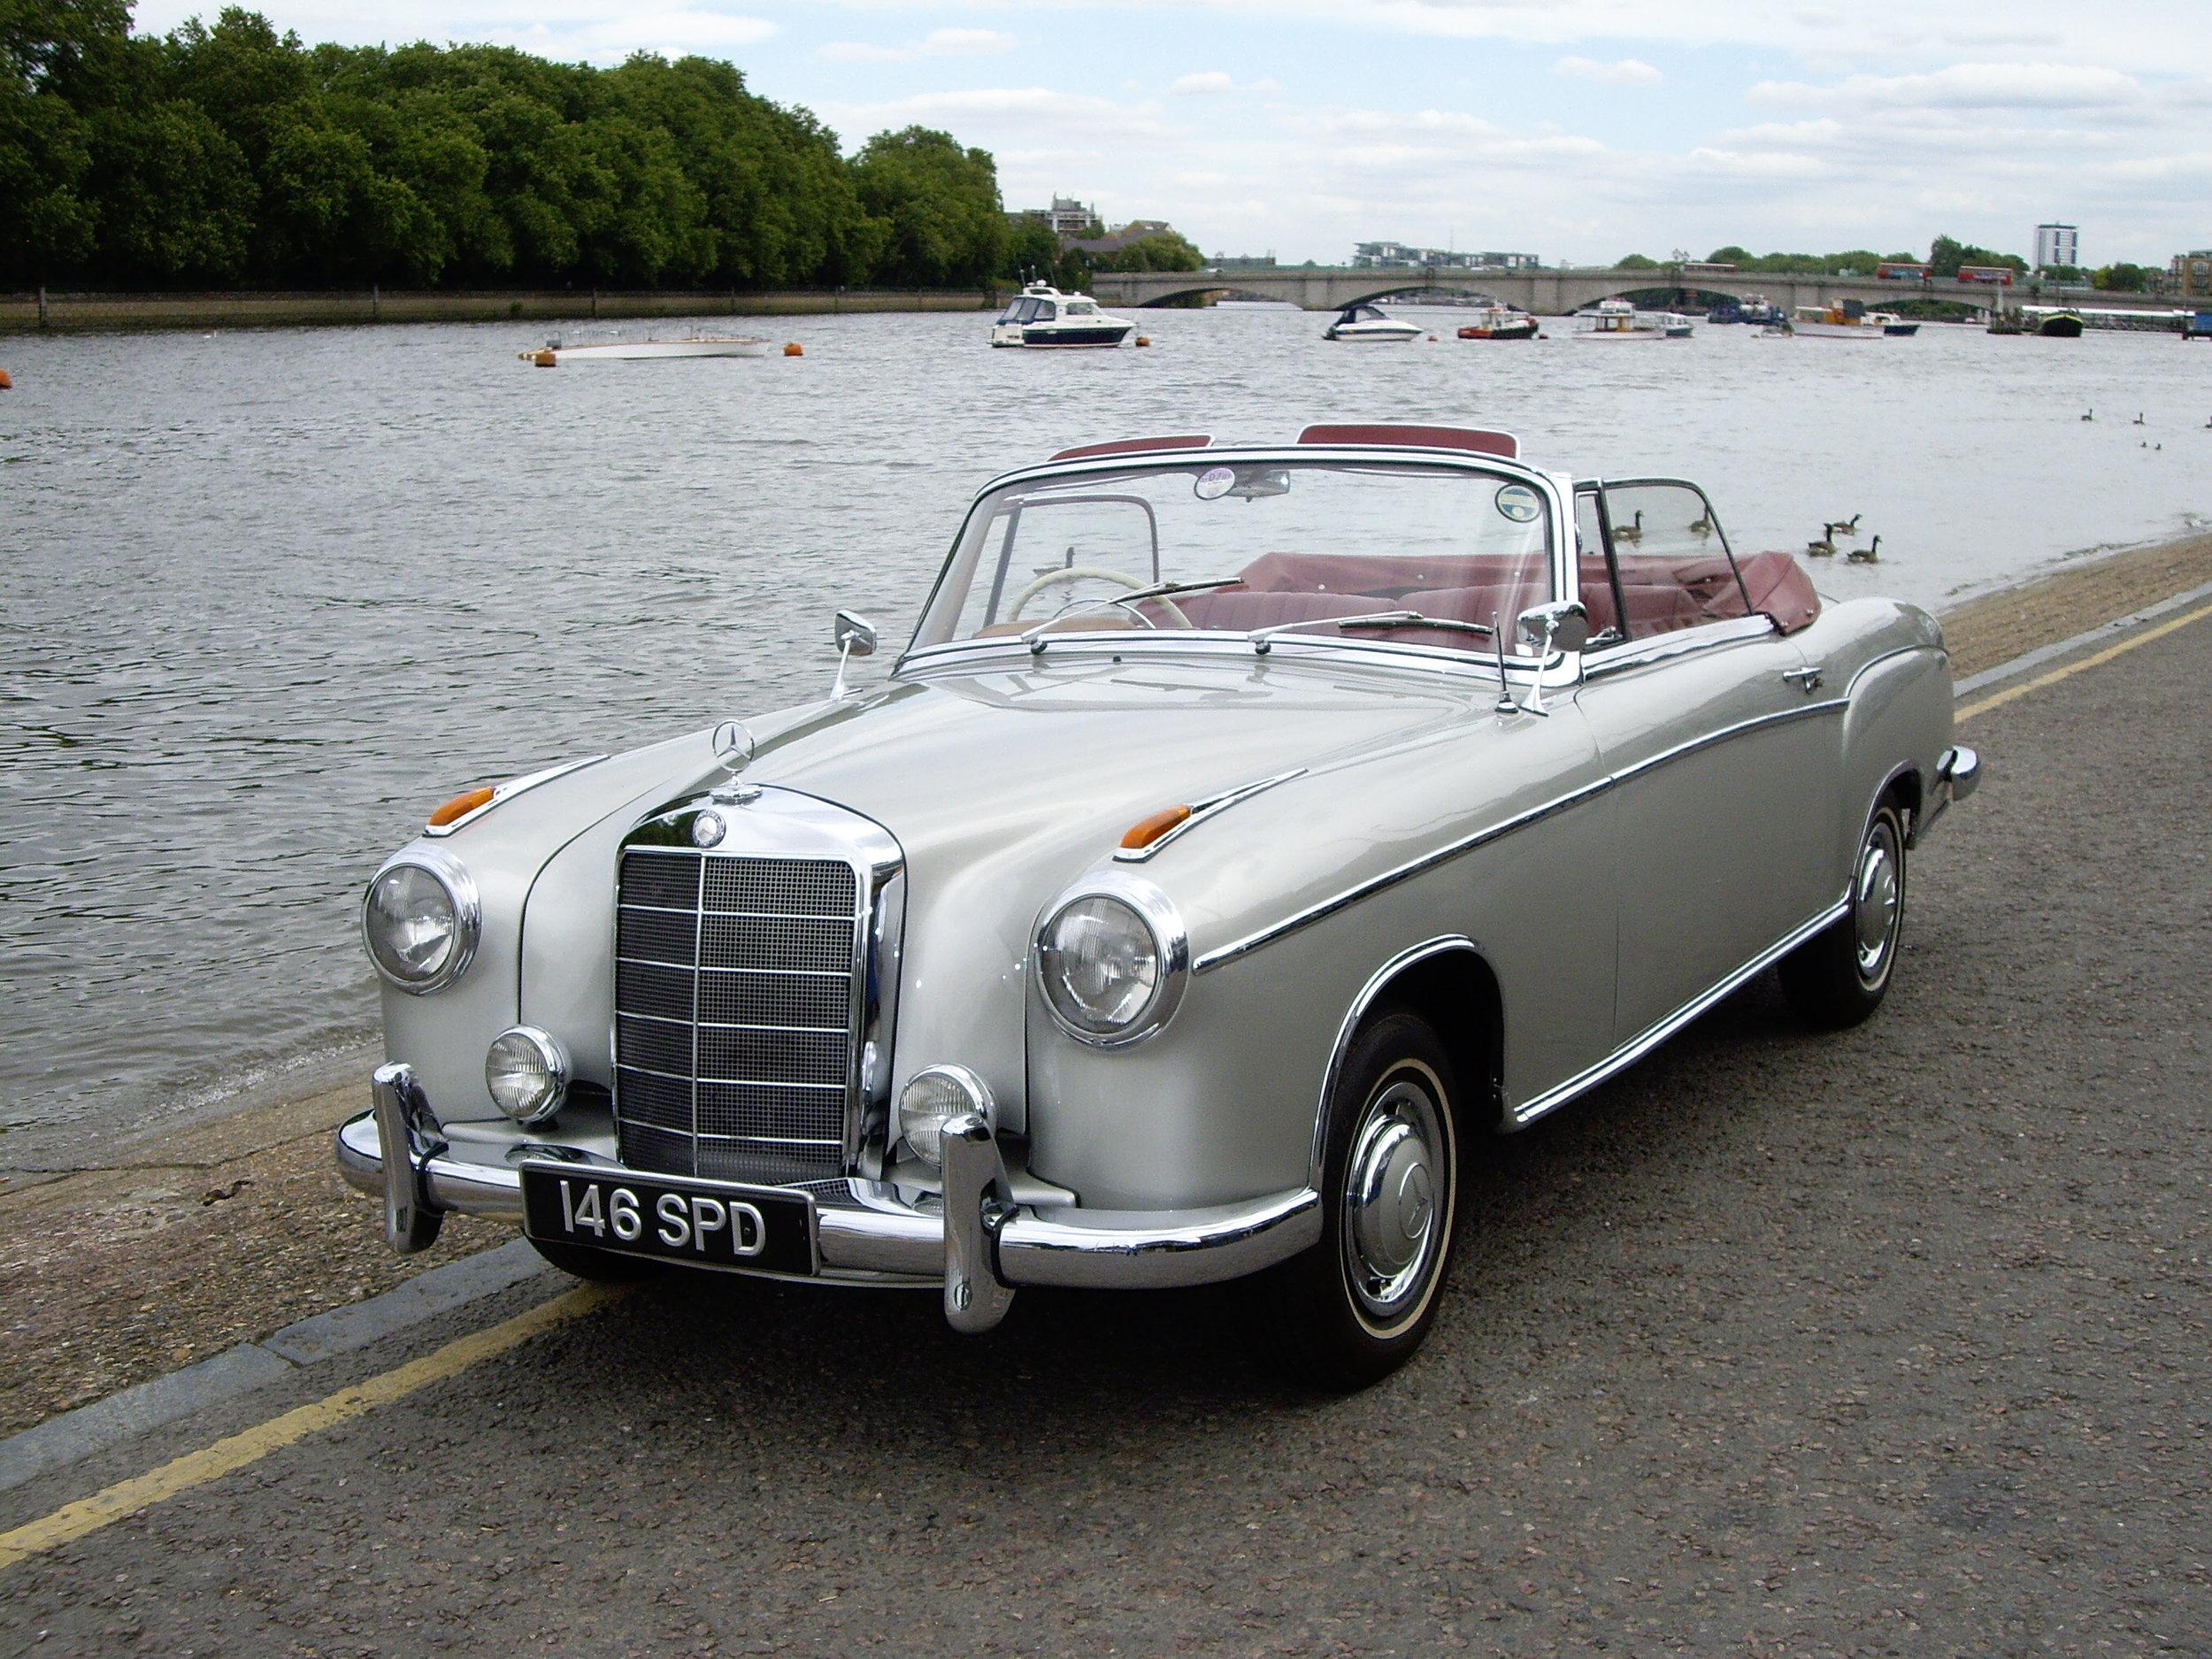 1960 Mercedes-Benz 220S Cabriolet